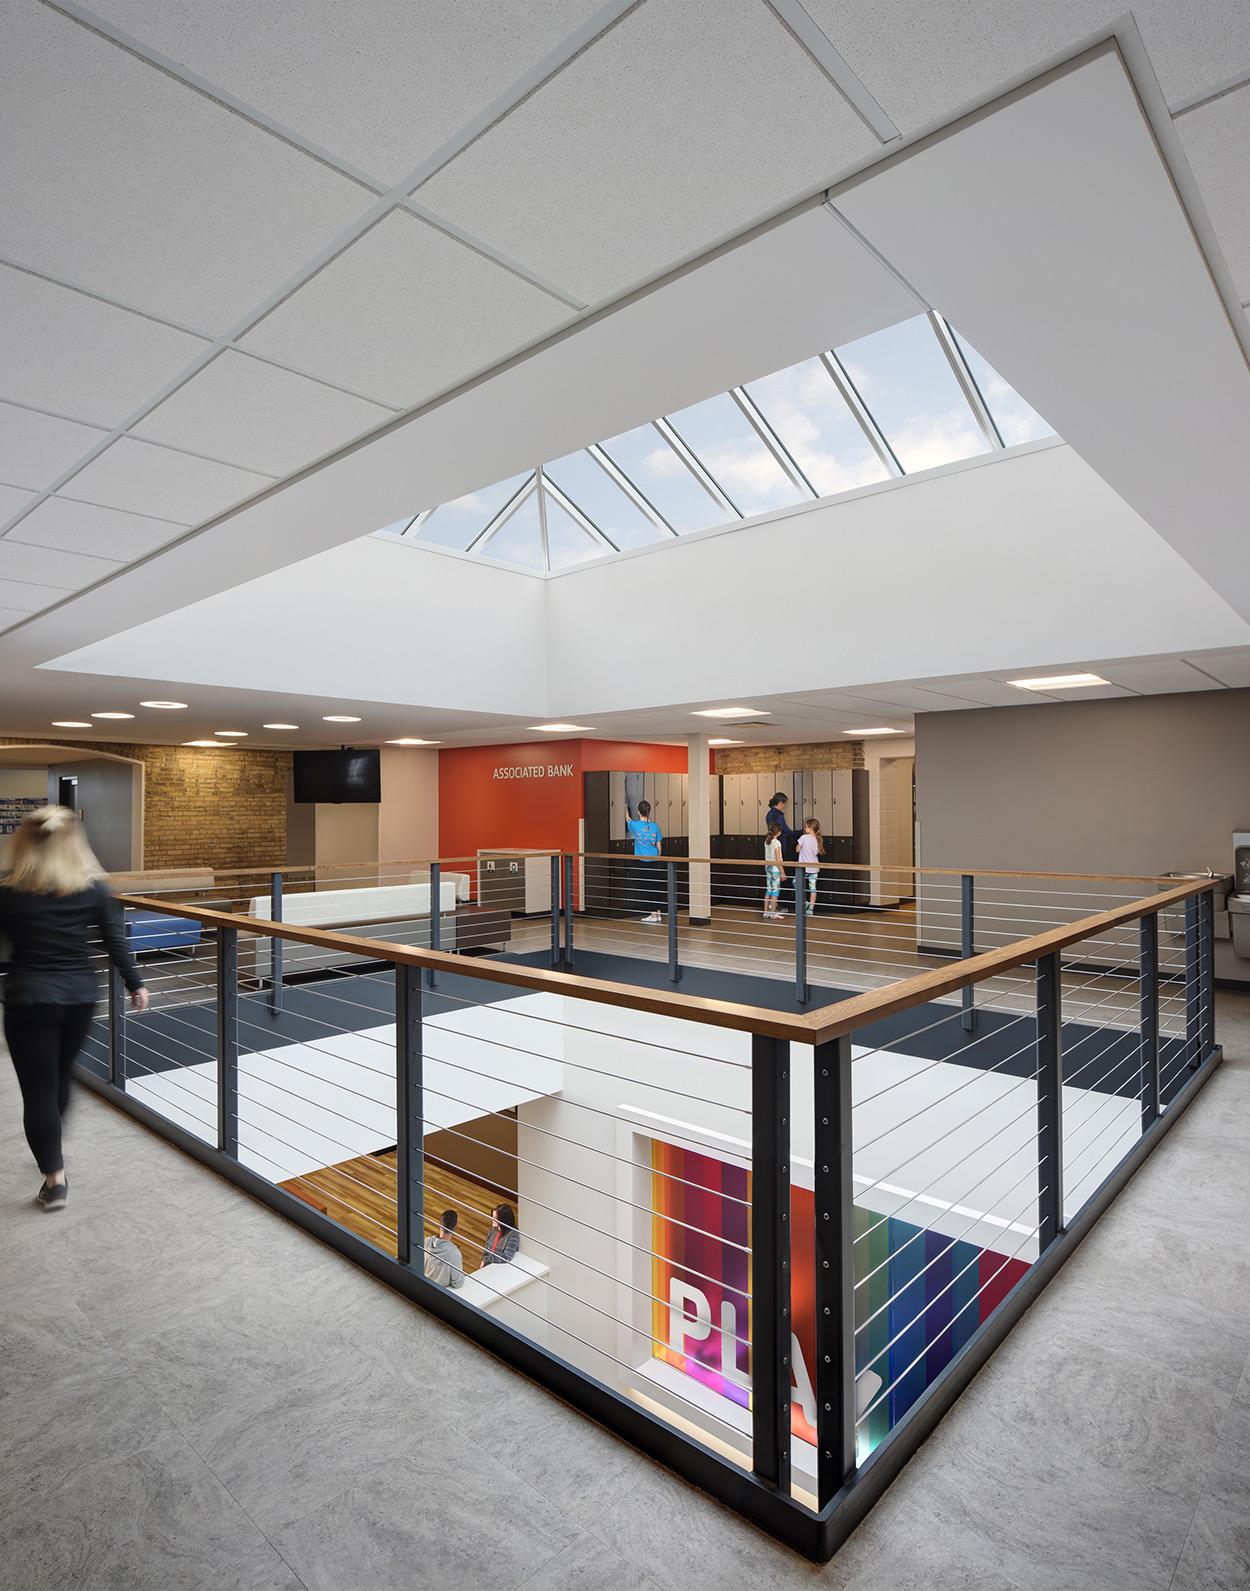 Health & fitness facility interior photography